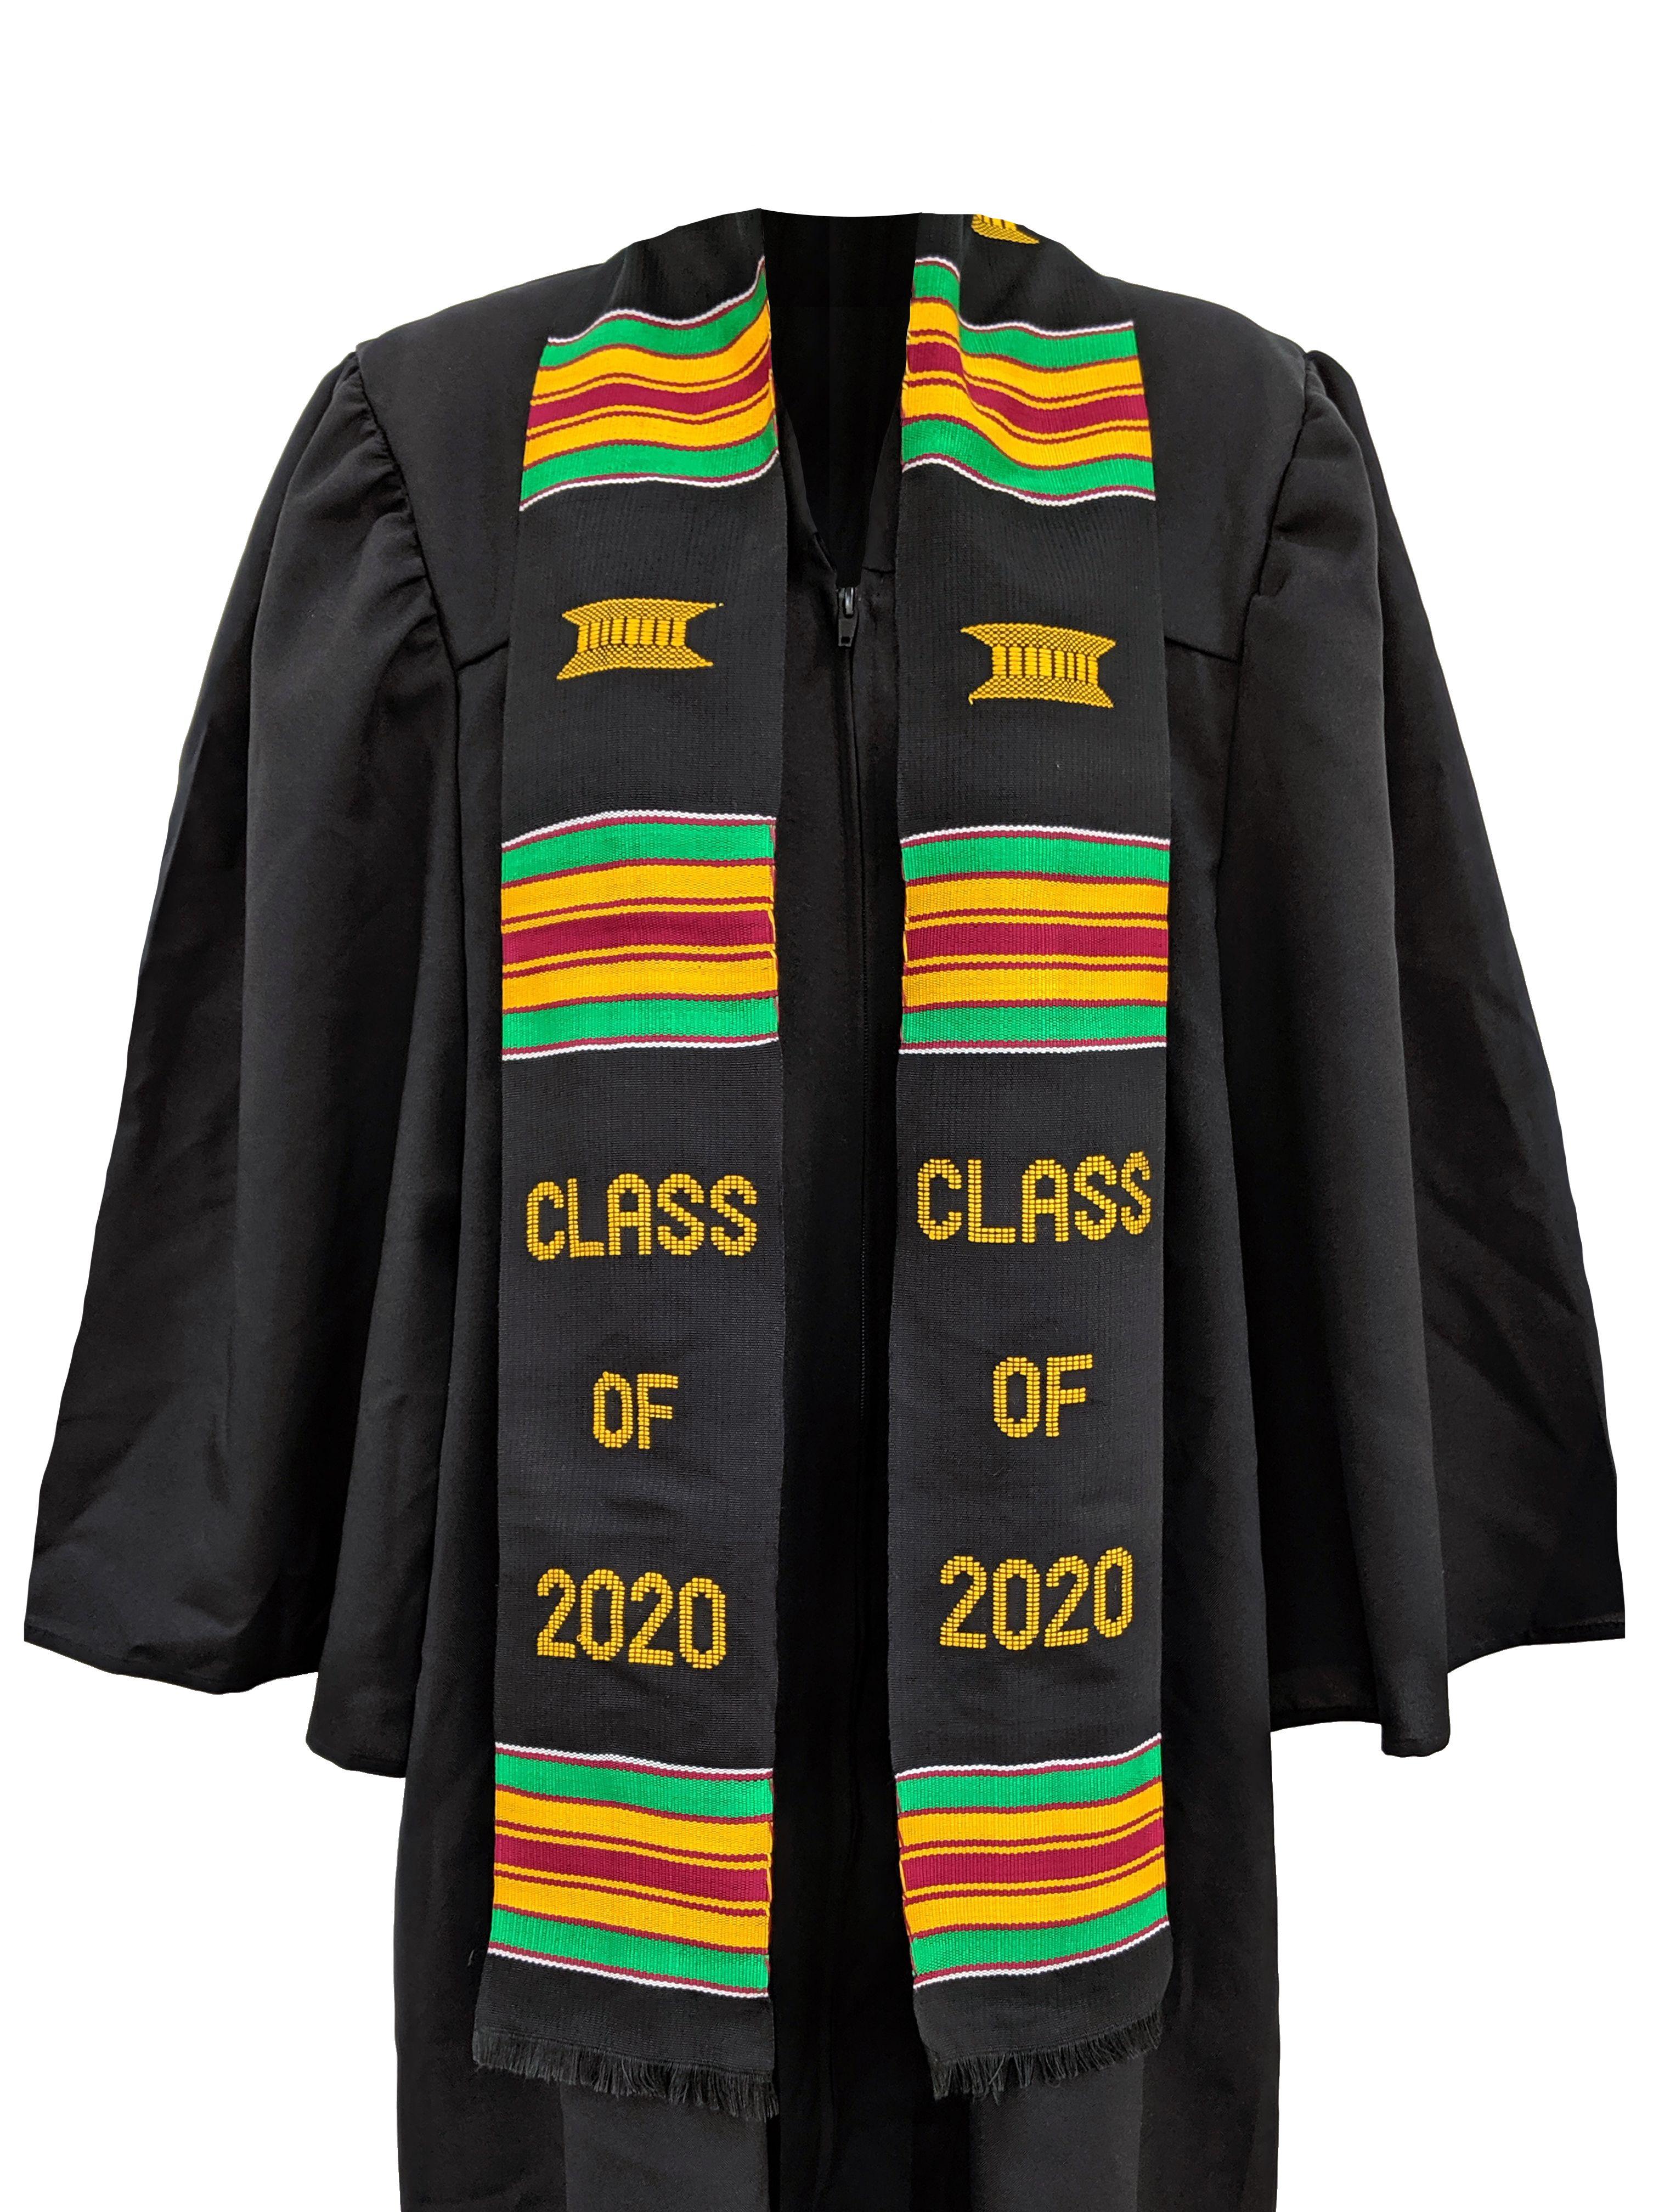 Authentic handmade kente graduation stoles class of 2020